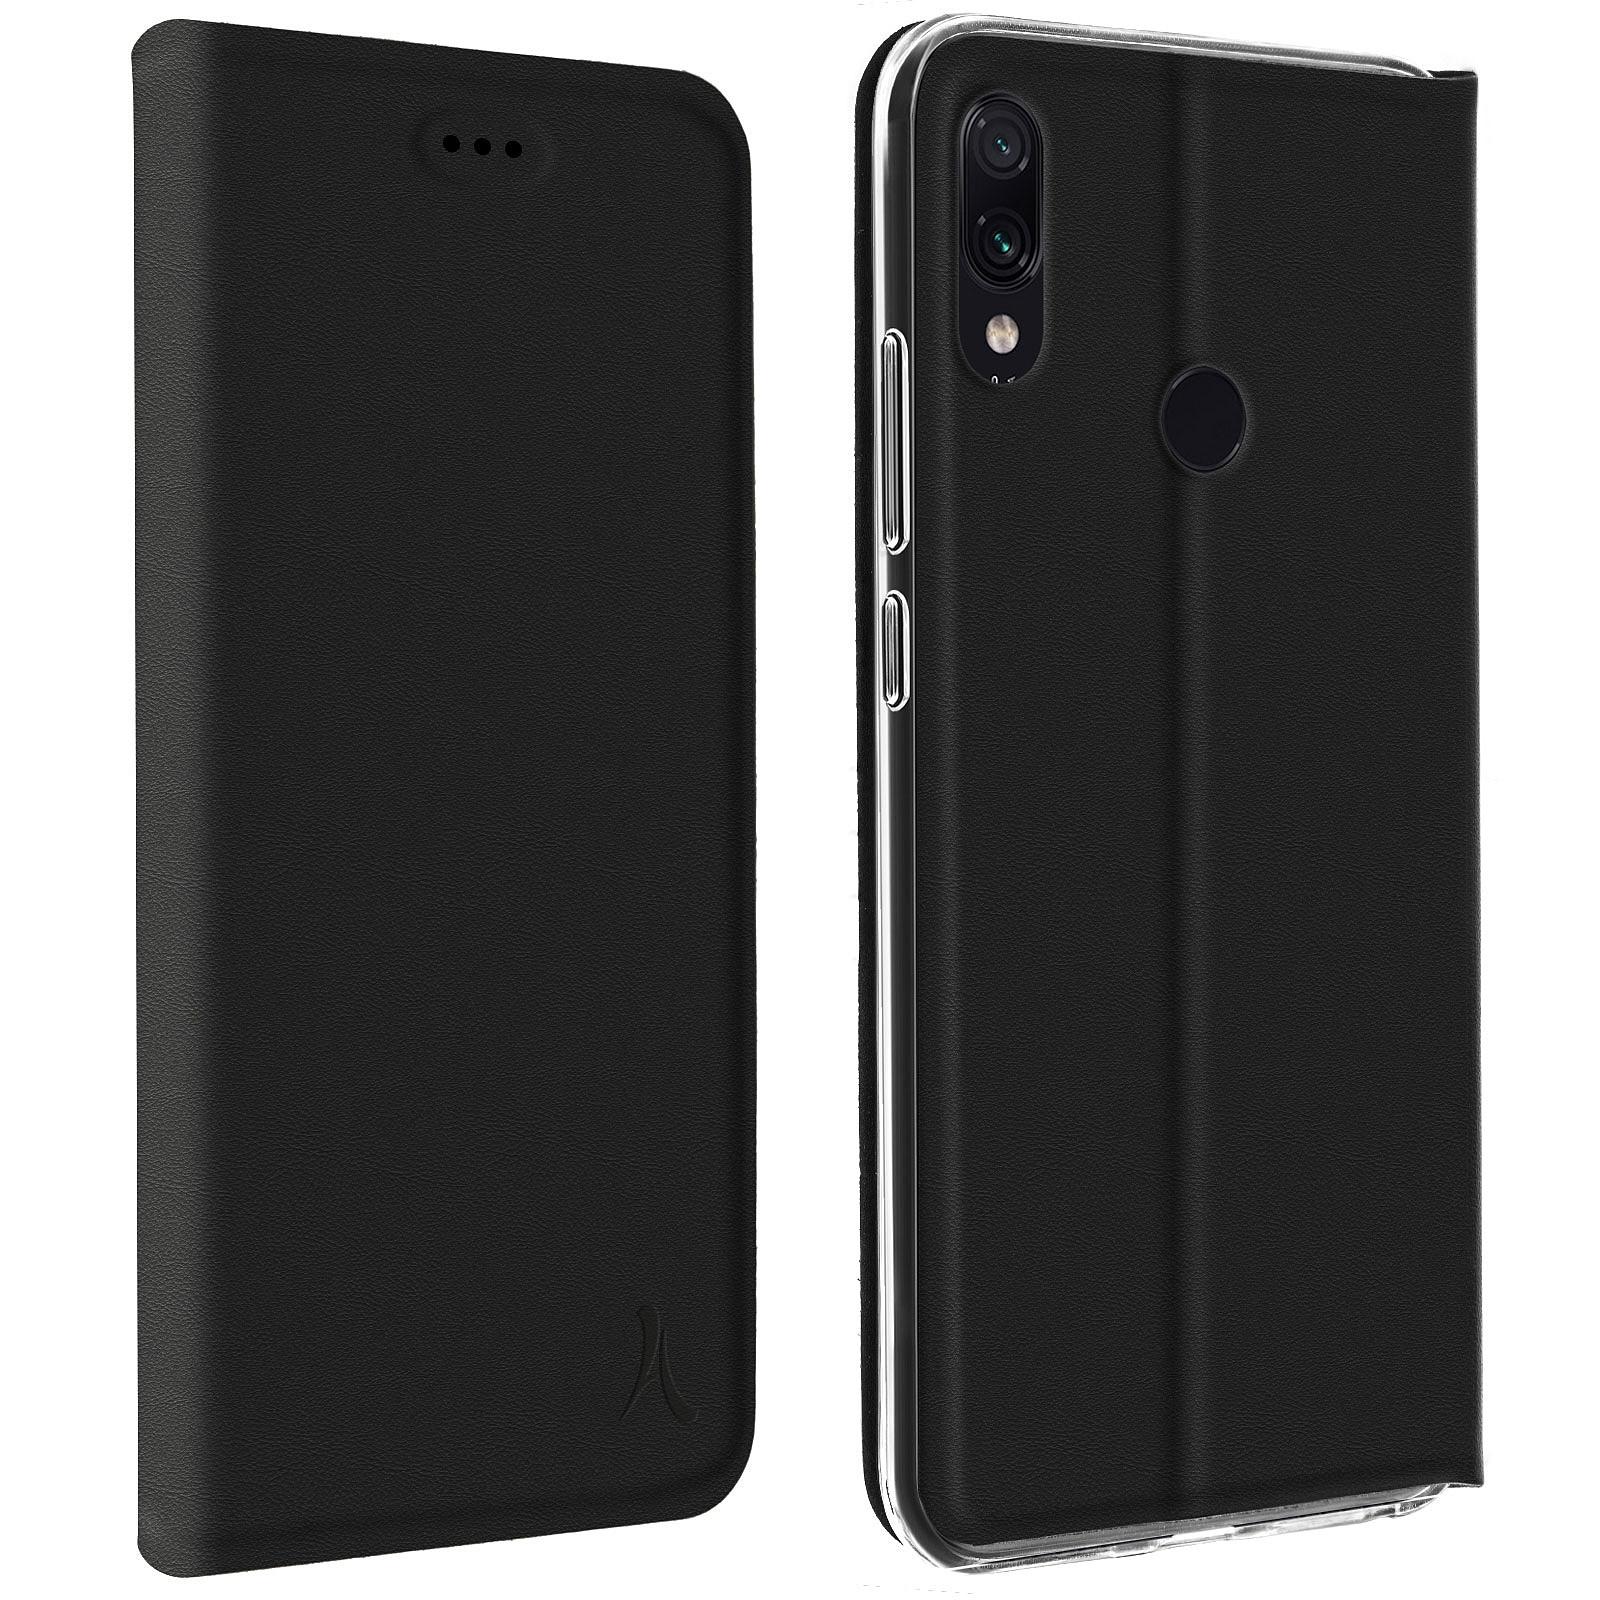 Akashi Etui Folio Porte Carte Noir Xiaomi Redmi 7